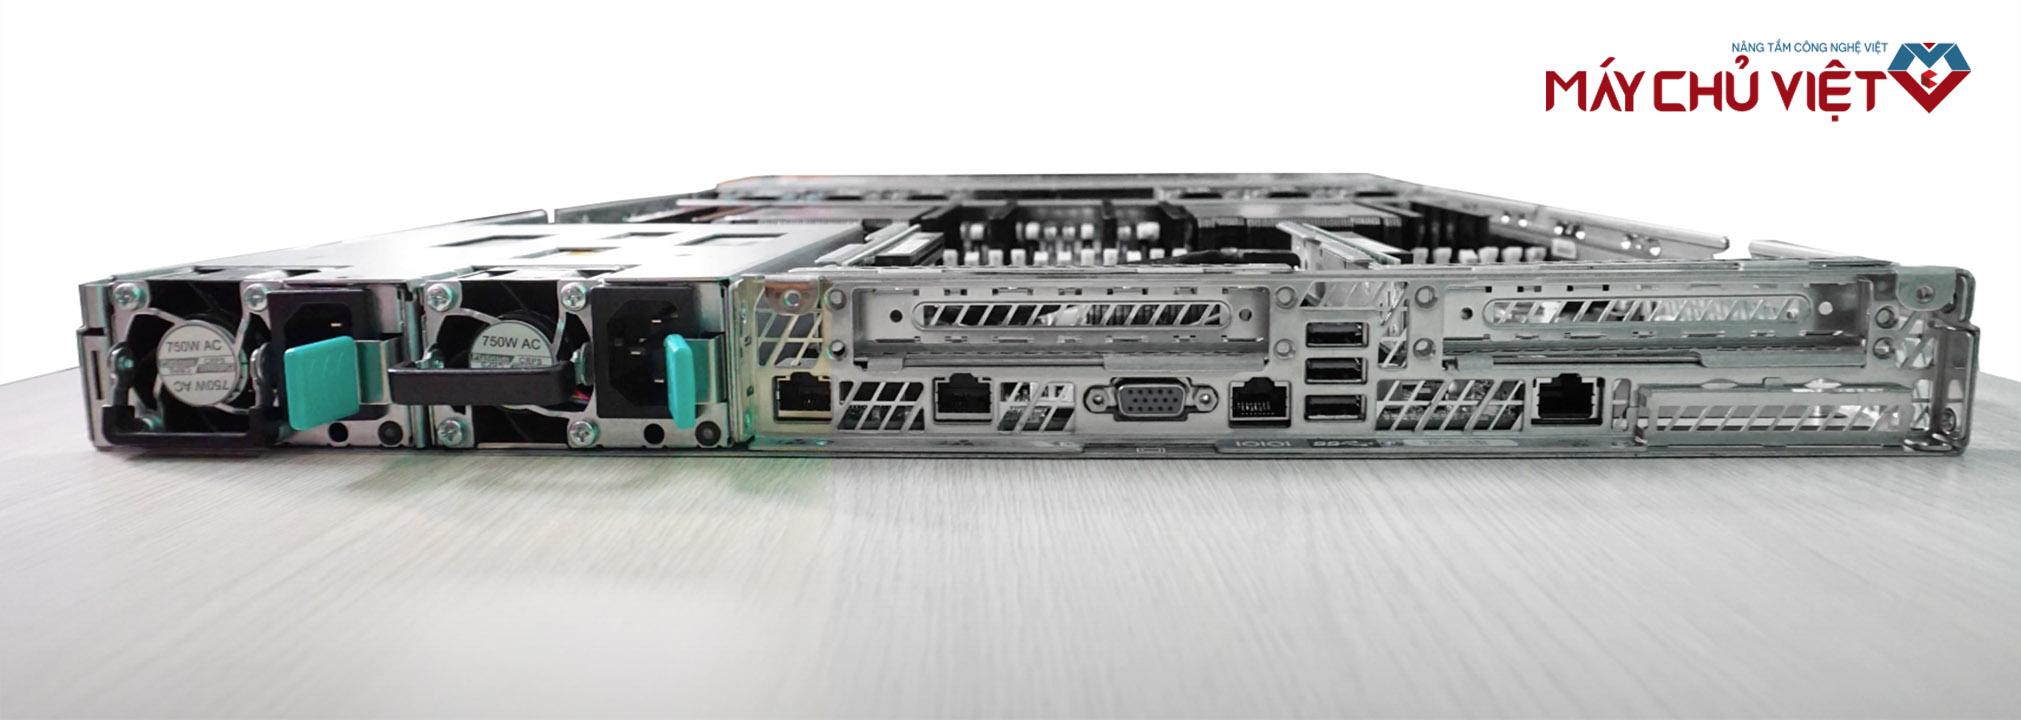 Mặt sau của máy chủ Intel R1304